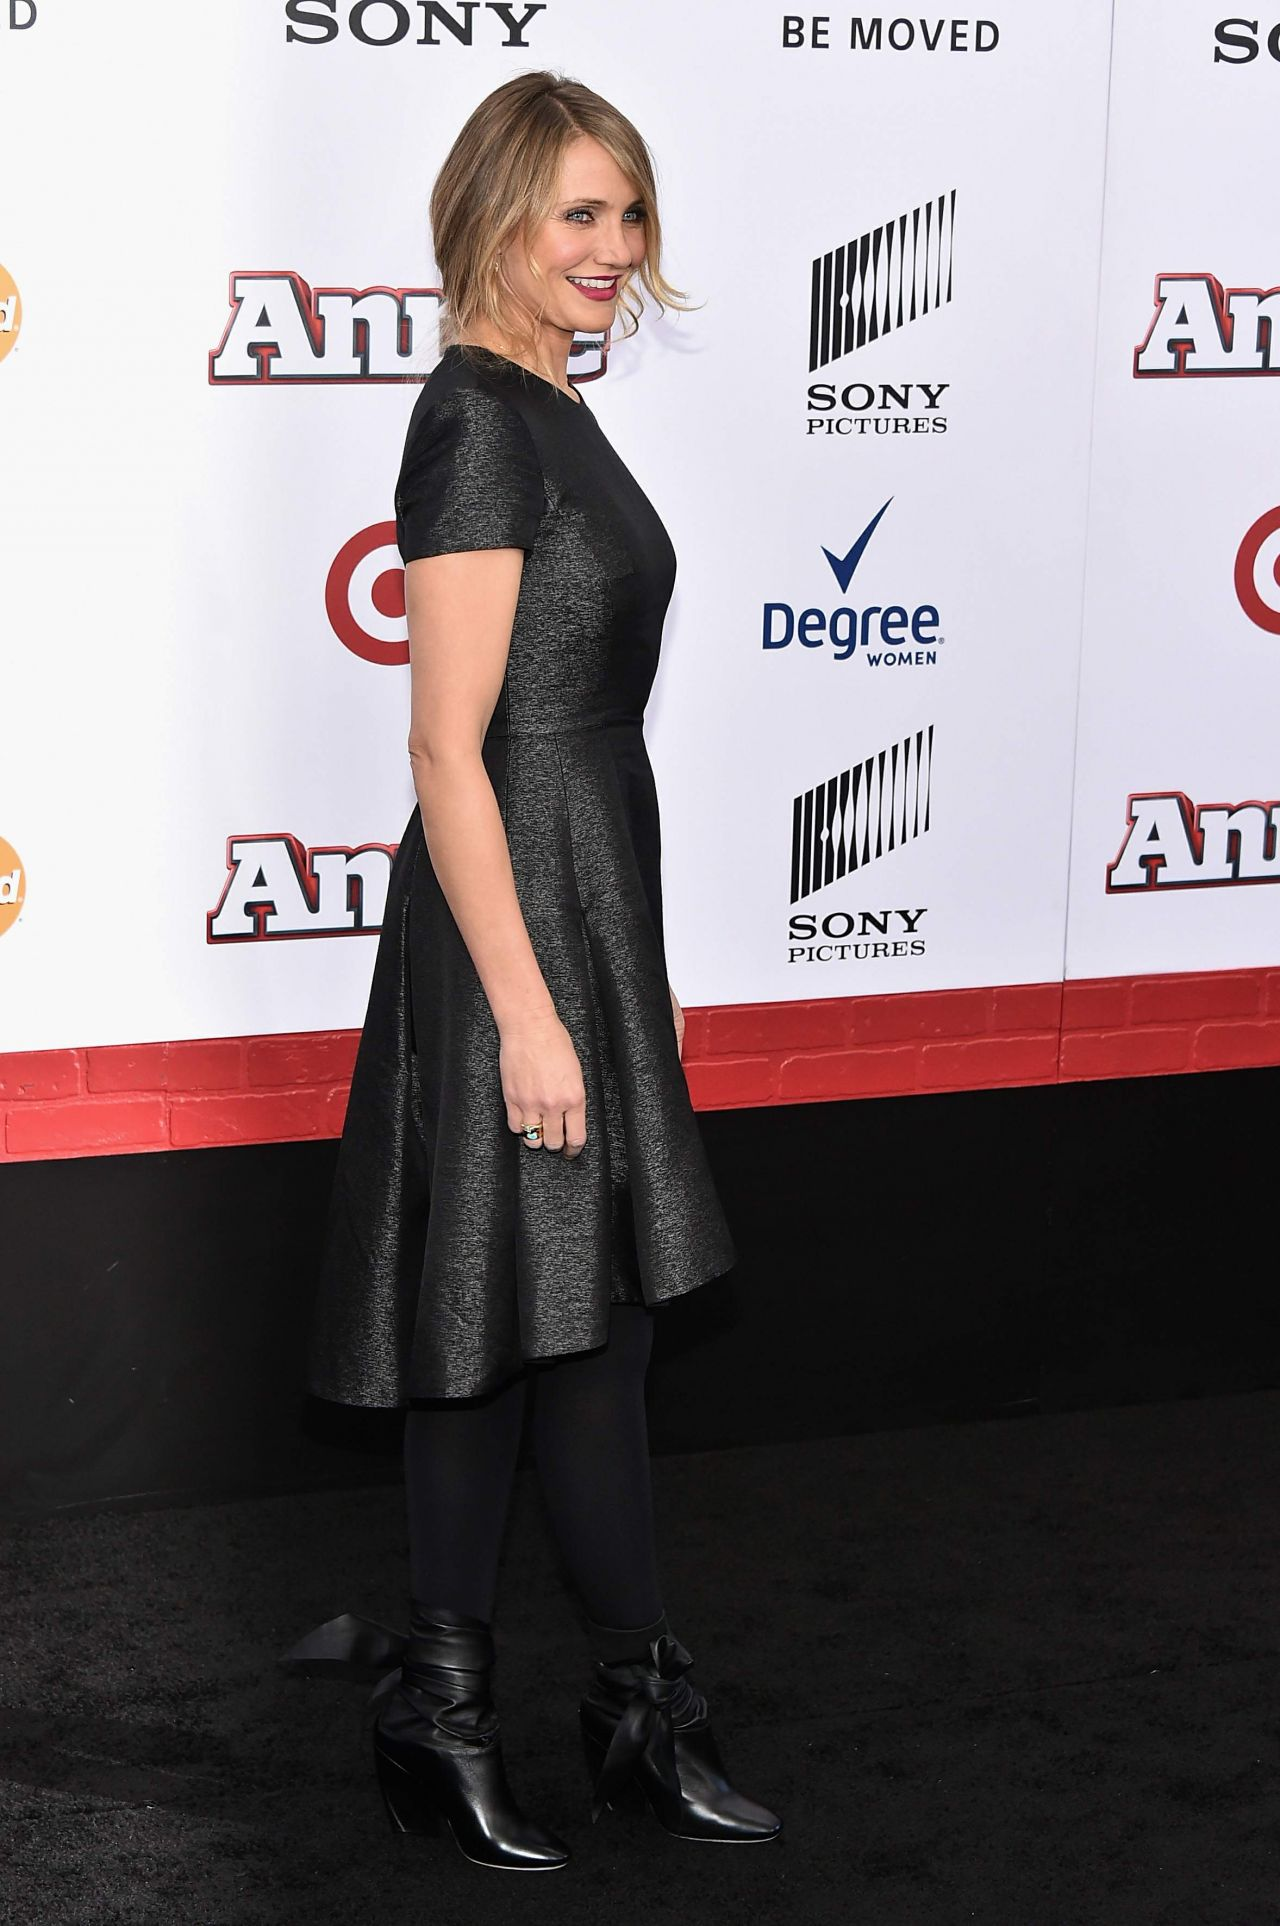 Cameron Diaz Annie World Premiere At Ziegfeld Theater